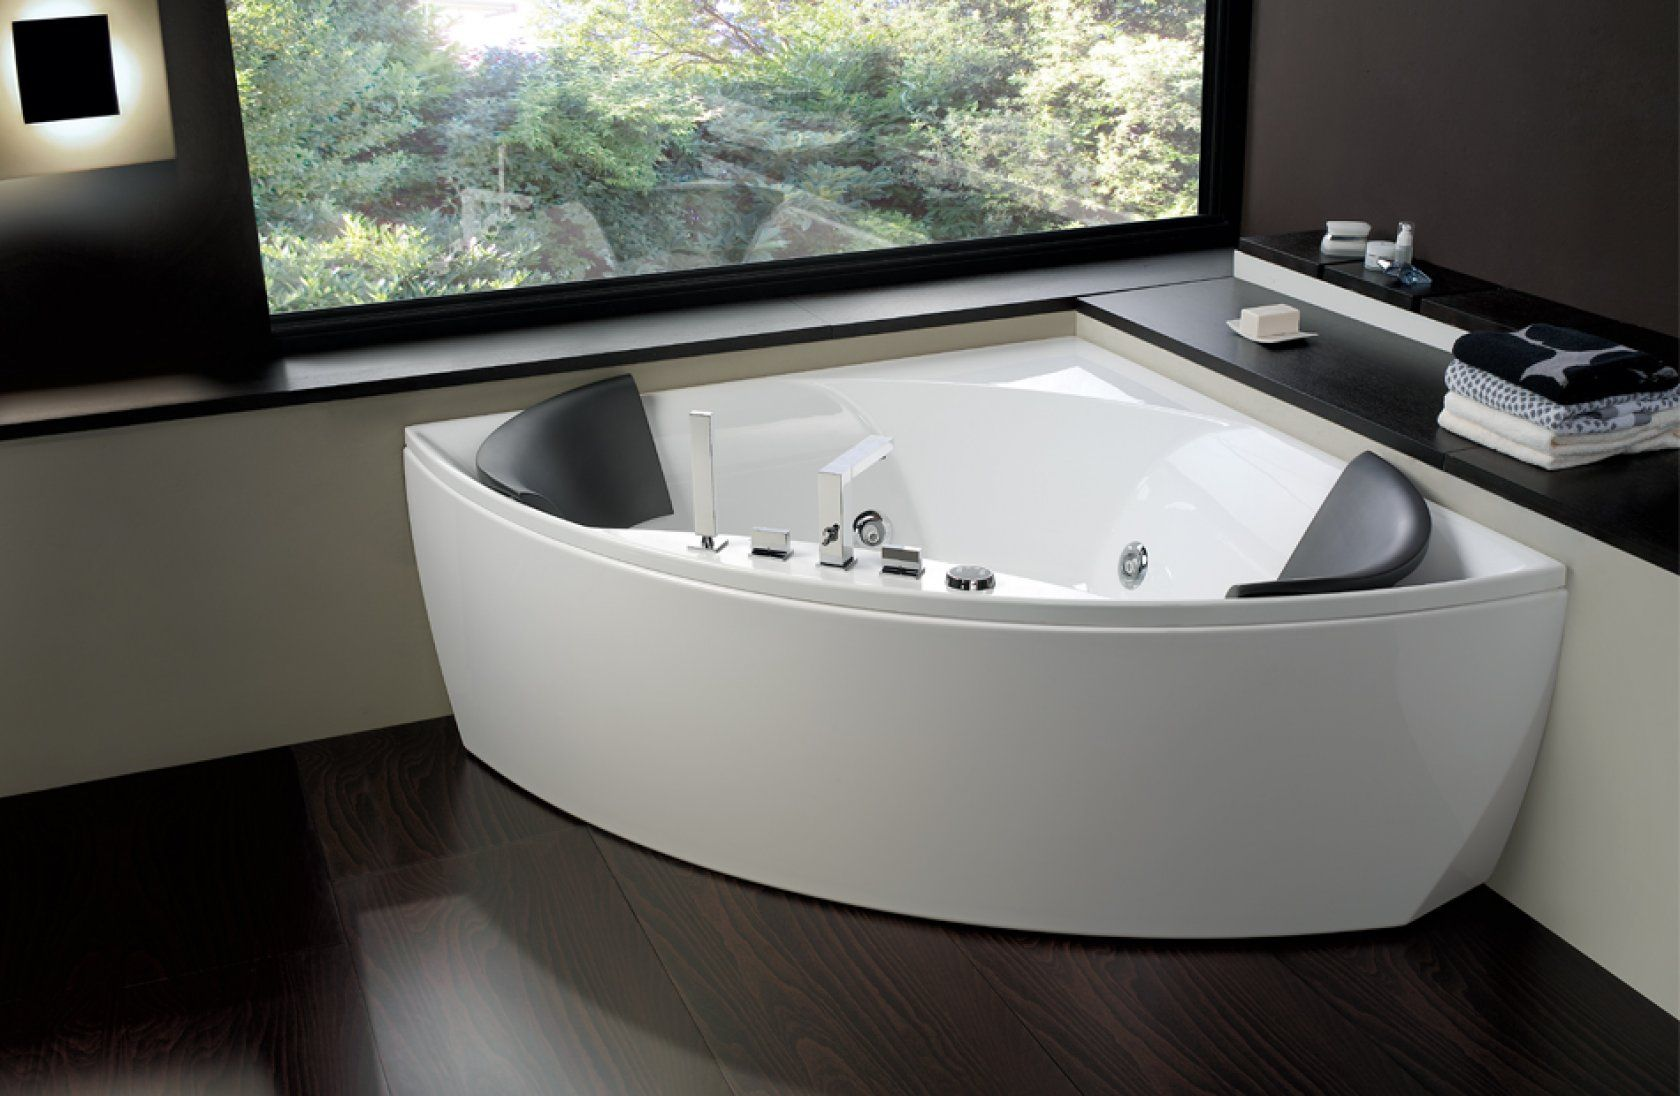 Vasca Da Bagno Angolare Jacuzzi : La vasca da bagno angolare arredo bagno pinterest